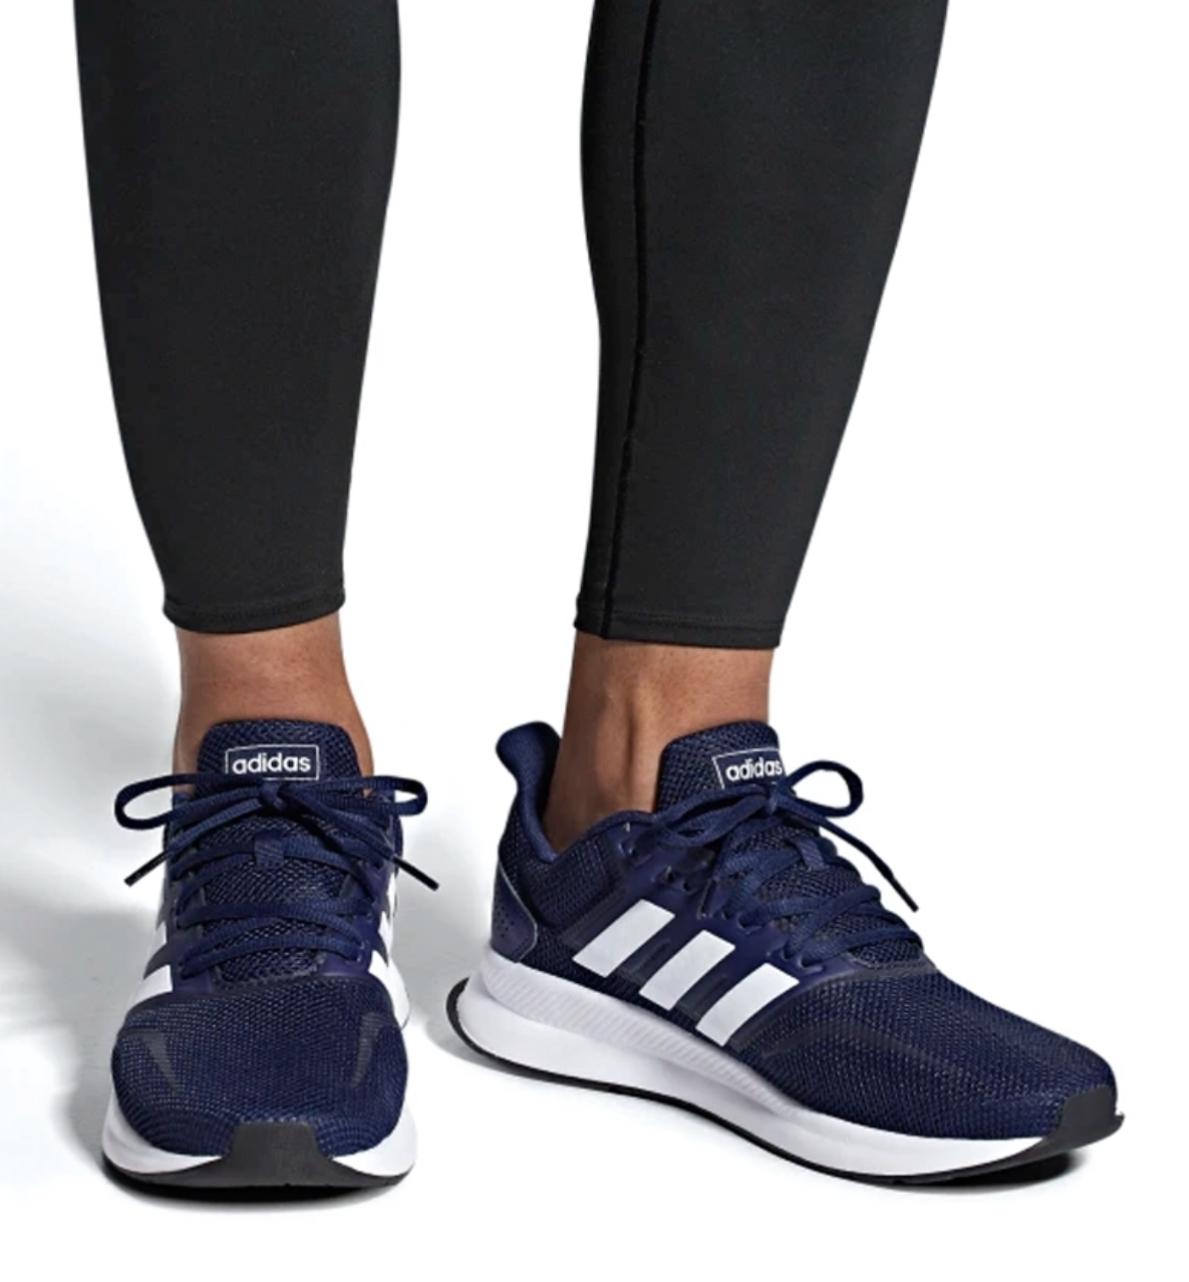 a26f678e Adidas - Zapatillas Runfalcon. Tienda Española. Negro-Rojo, Azul, Gris -  chollometro.com